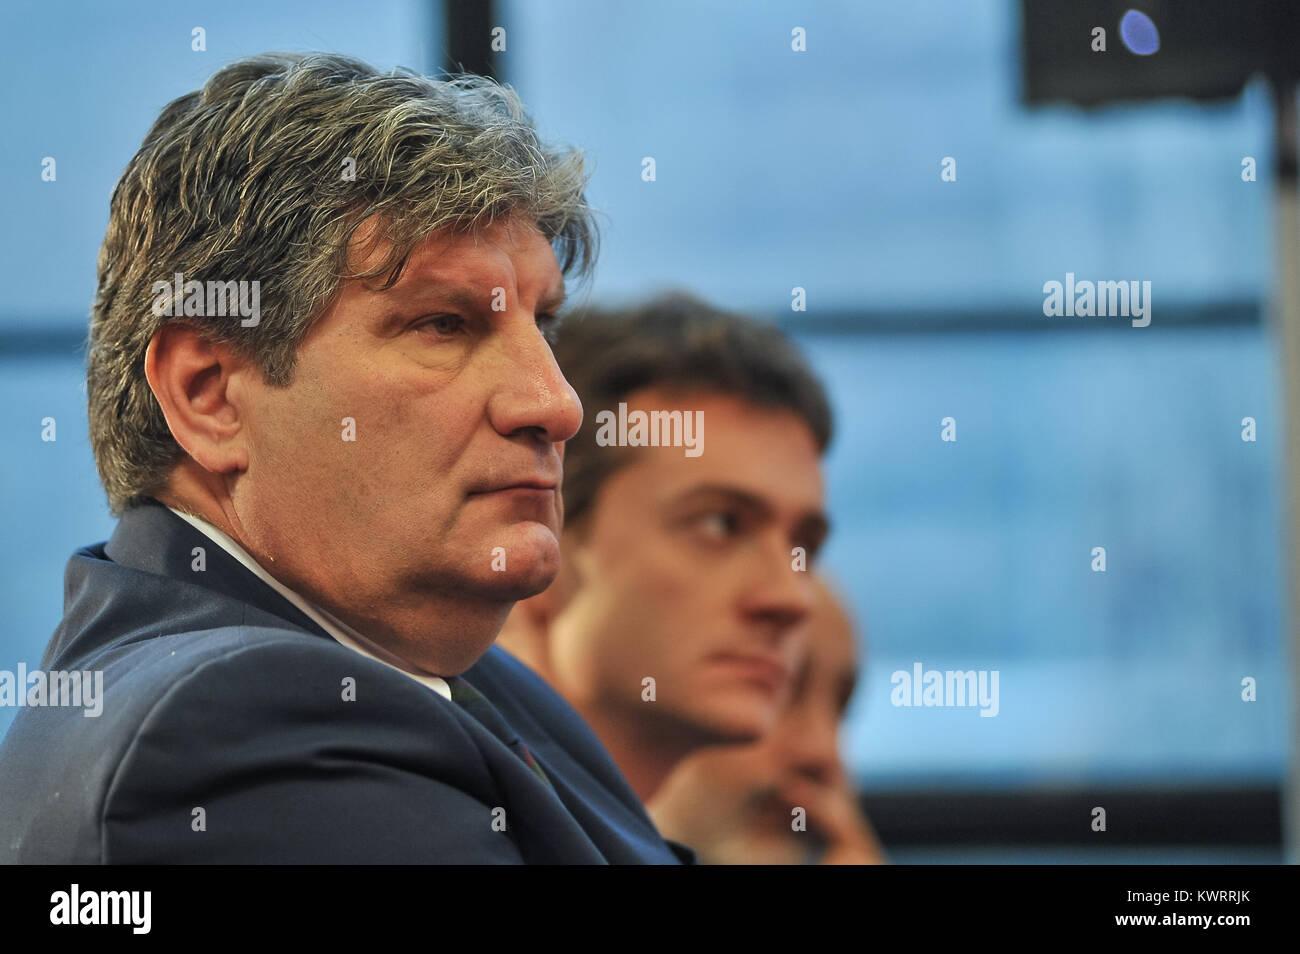 Turin, Italy. 5th Jan, 2018. Antonio Comi dirigent Torino FC during the first media conference presentation Walter Stock Photo